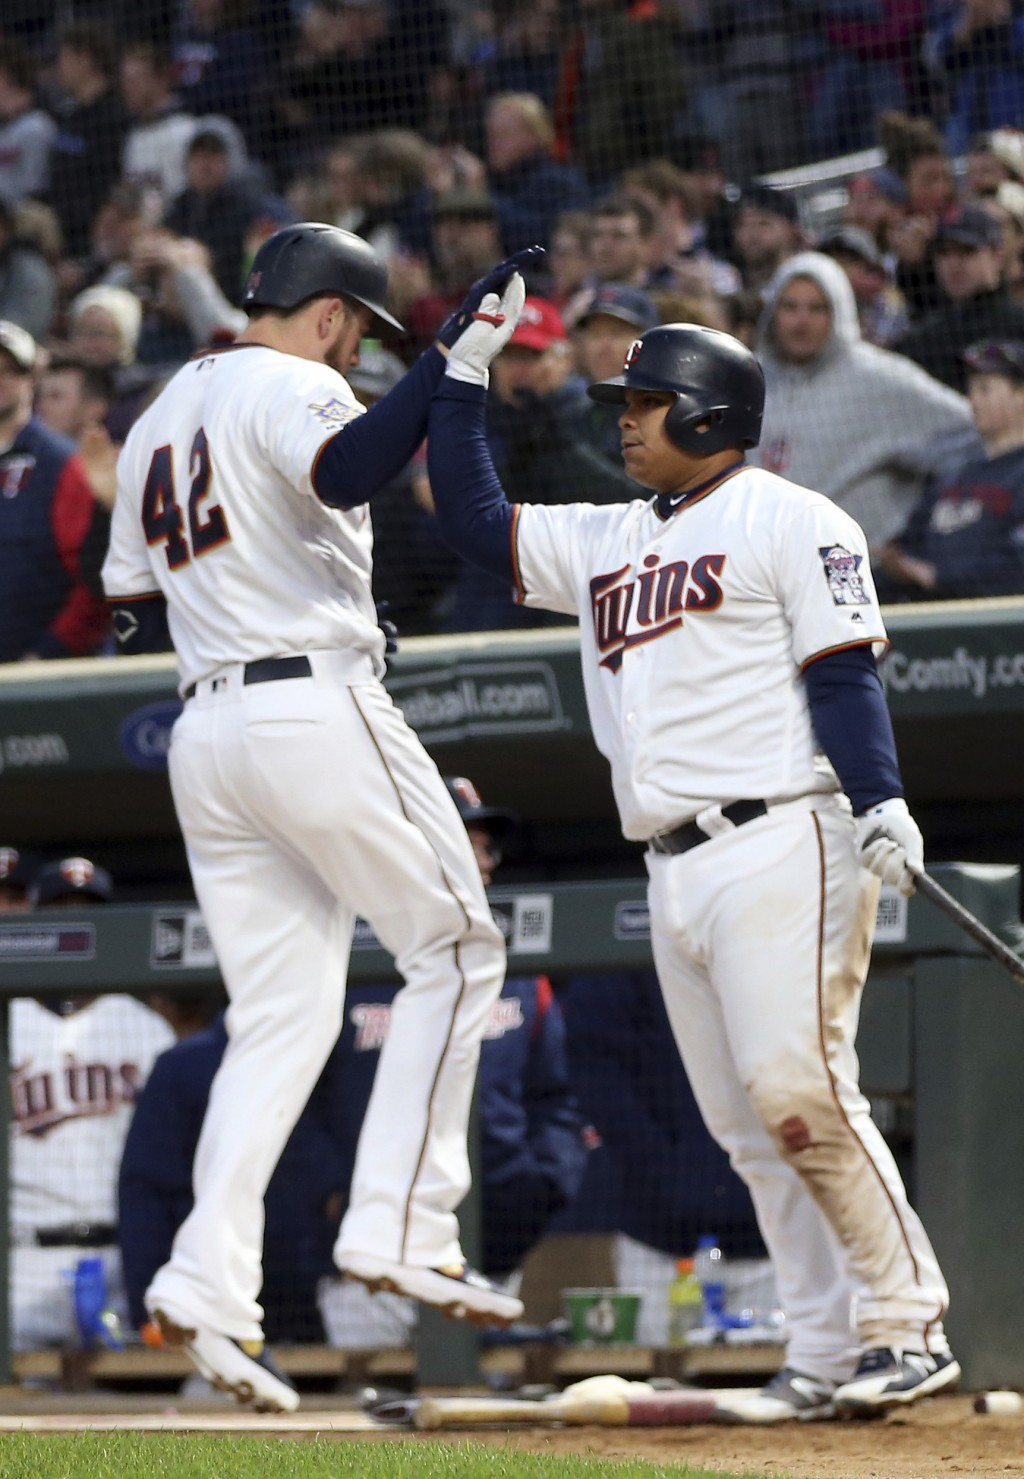 Minnesota Twins' C.J. Cron, left, celebrates his three-run home run off Toronto Blue Jays pitcher Matt Shoemaker with Willians Astudillo in the fourth